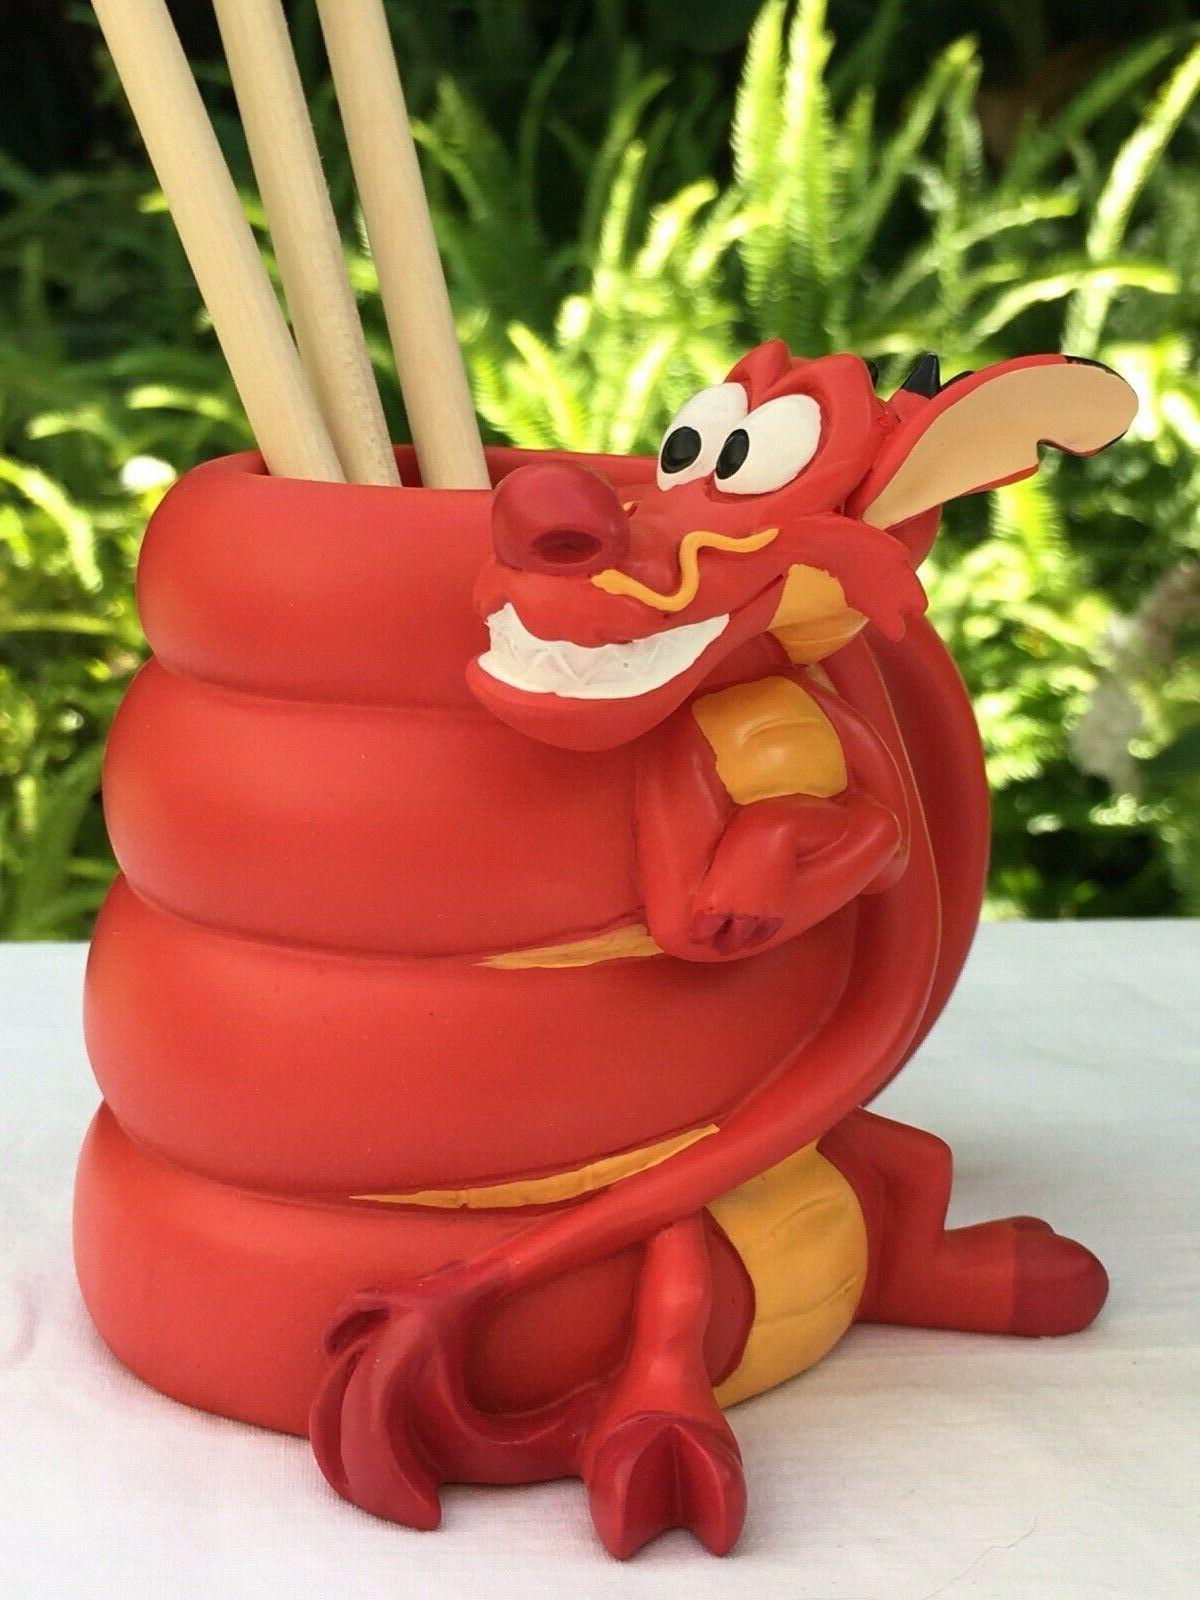 Disney Mushu Pencil Holder Cri-Kee topped Pencils